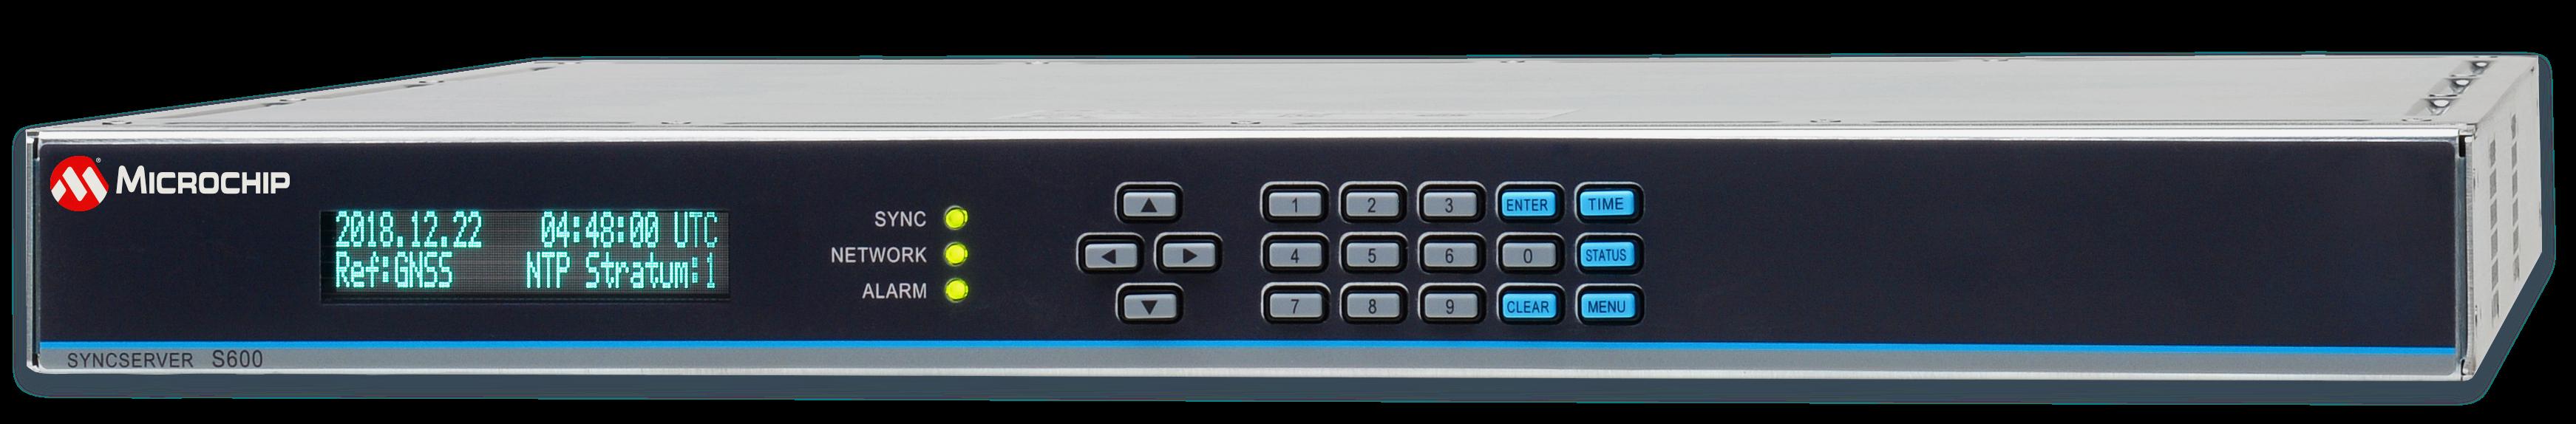 Microchip推出可防止GPS干扰和欺骗的新版SyncServer S600系列 时间服务器